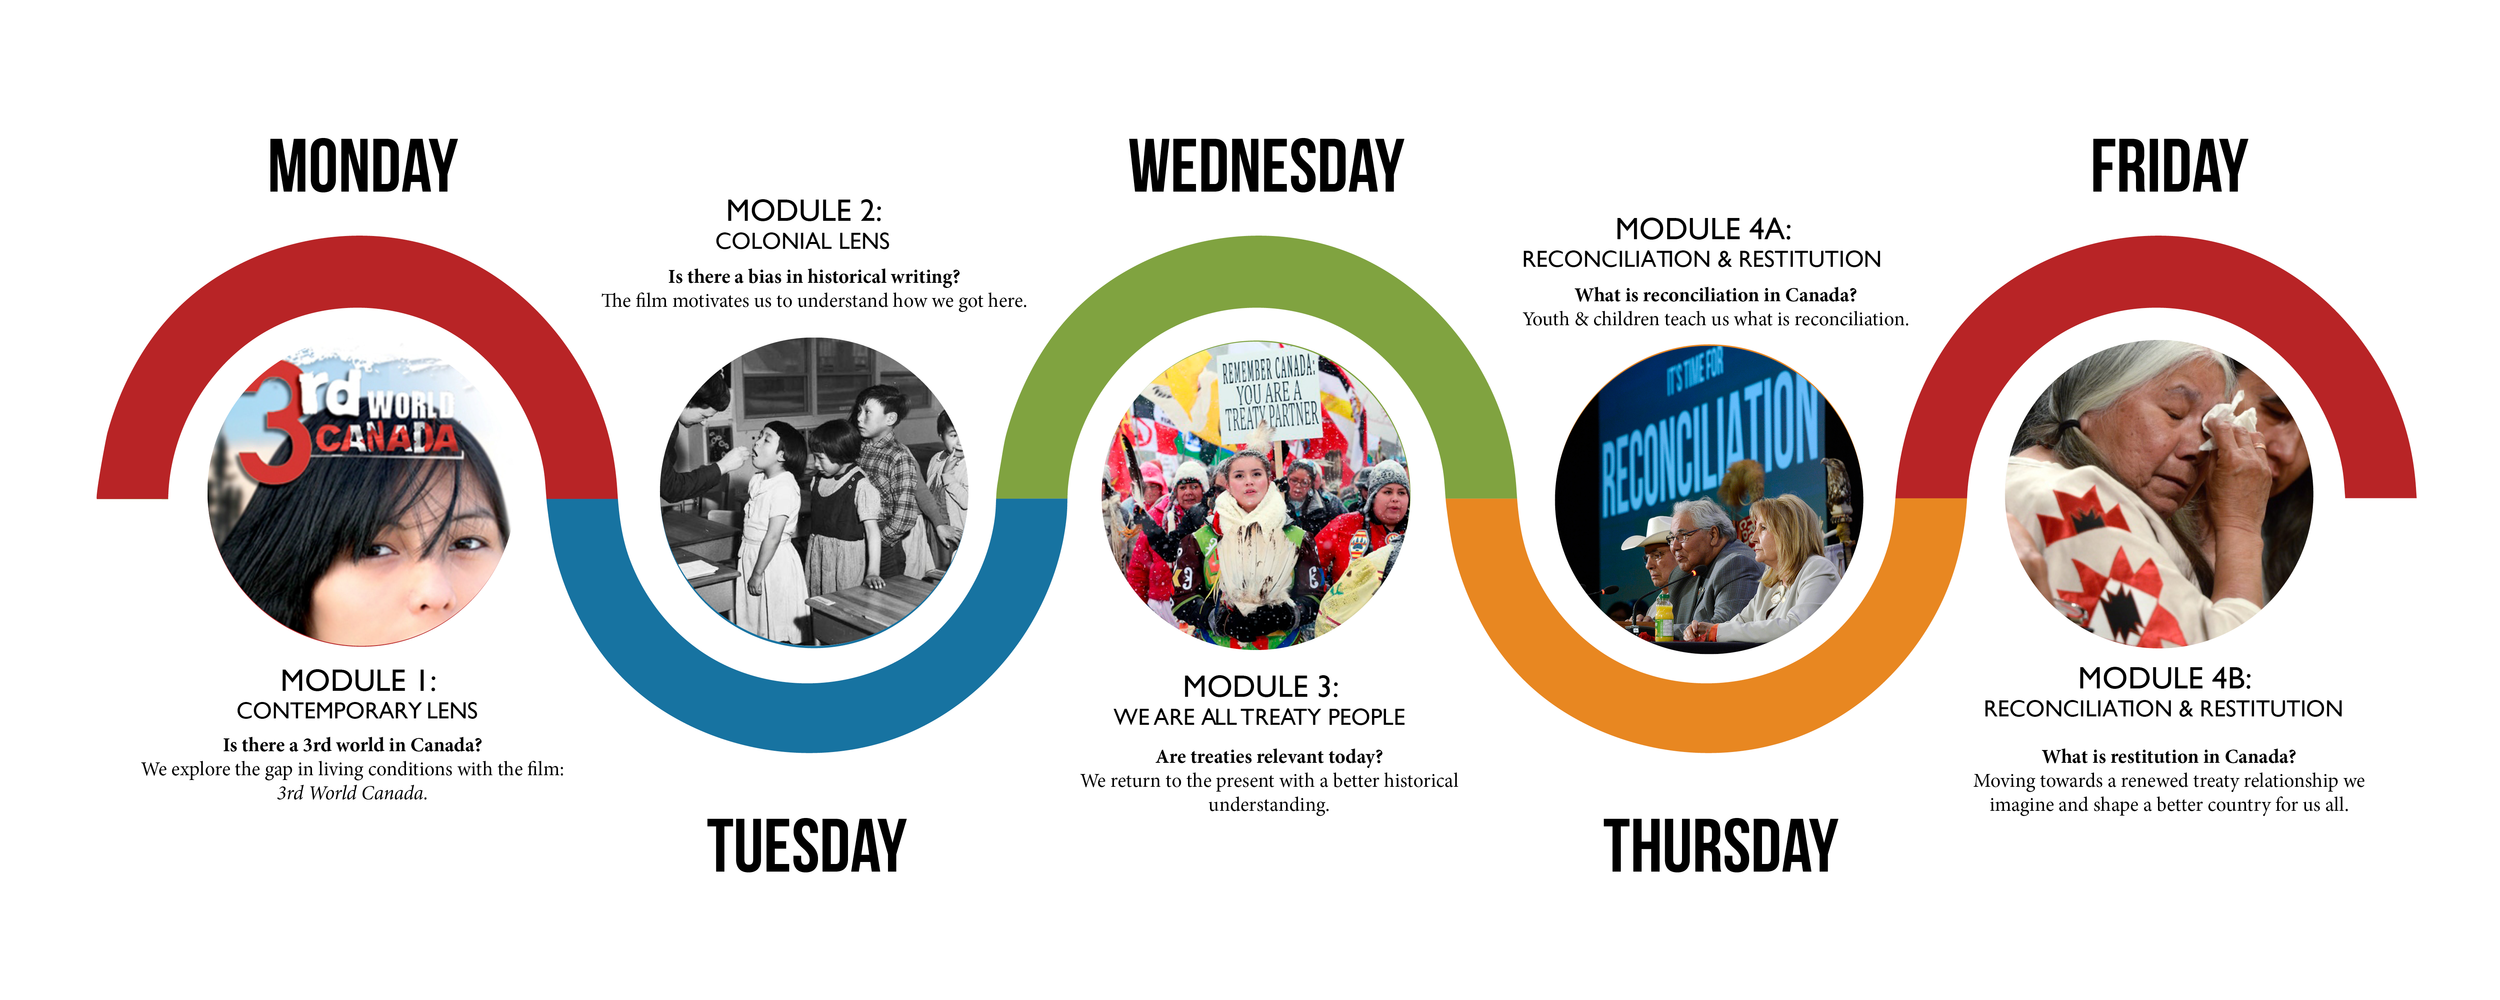 The weeklong journey of 4 seasons unit graphic